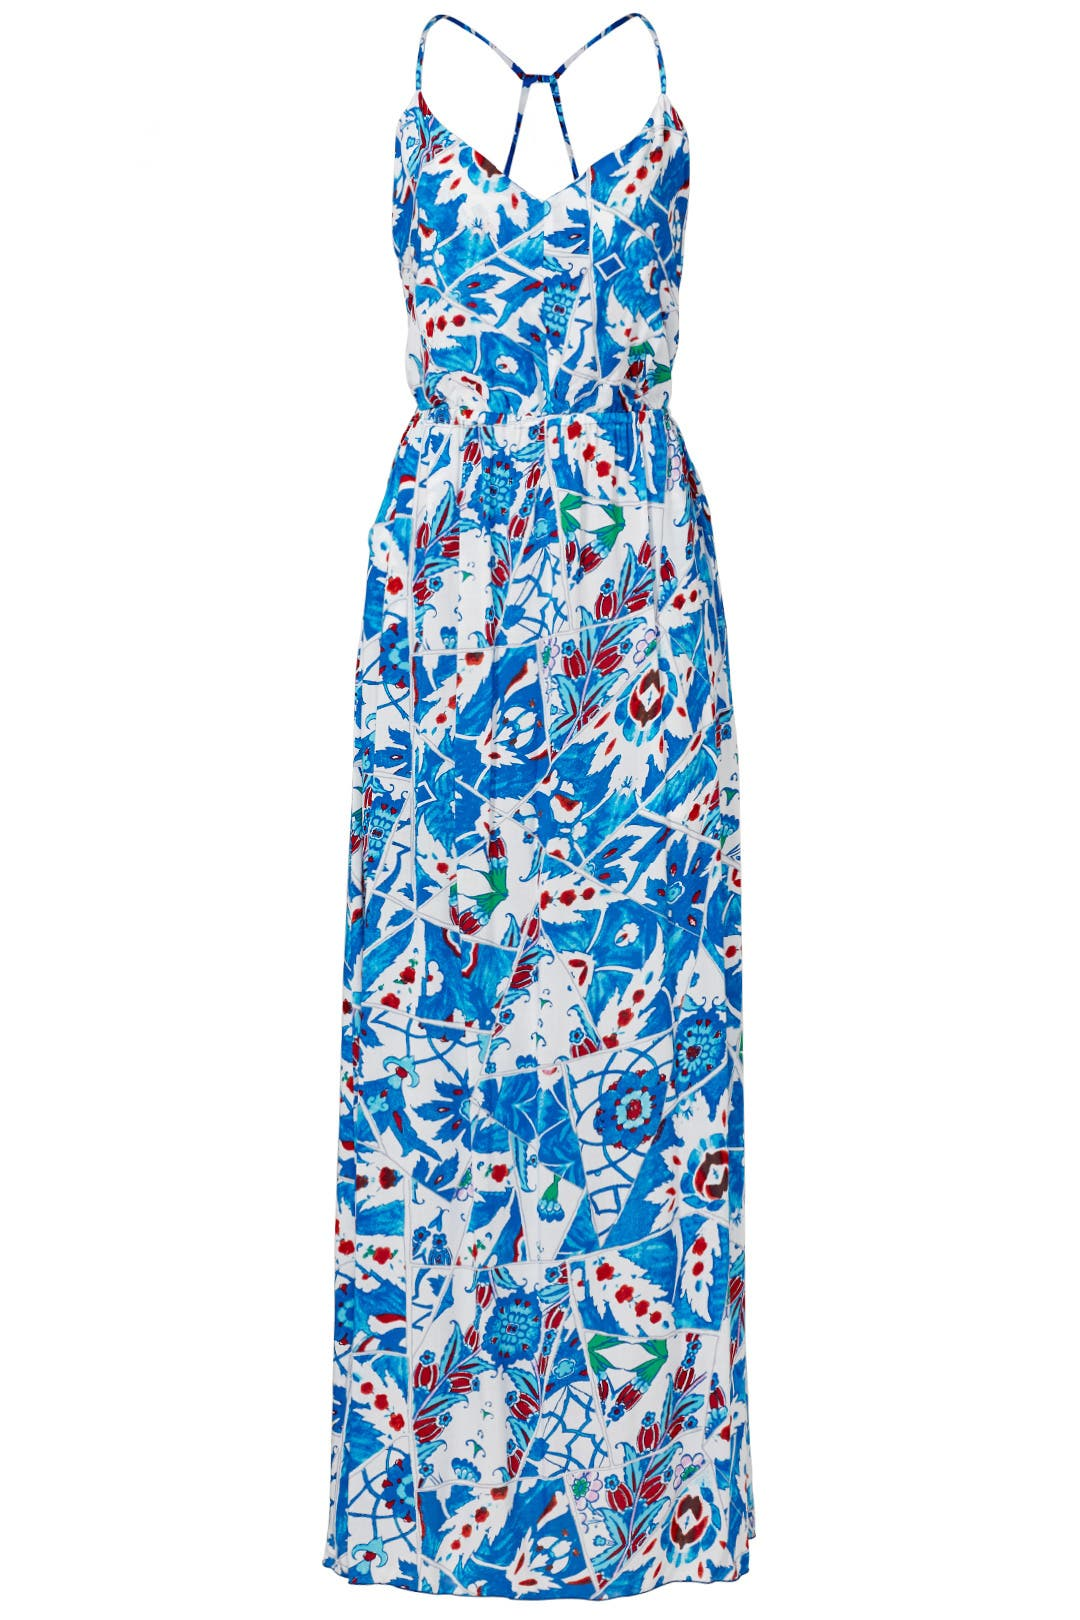 Desert Flower Print Maxi Dress by Josie by Natori for $40 - $55 ...